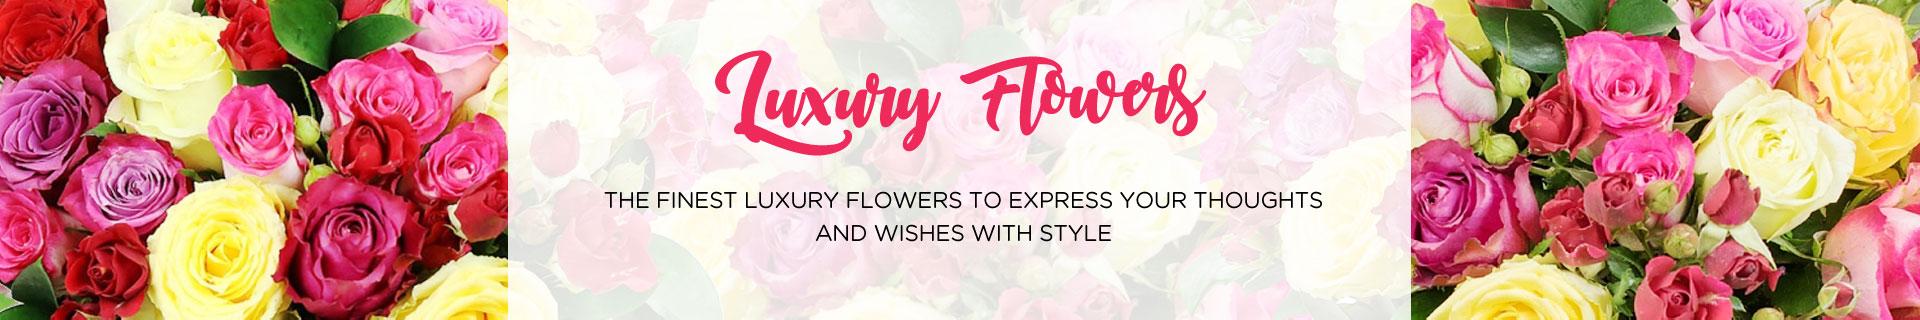 Luxury Flowers